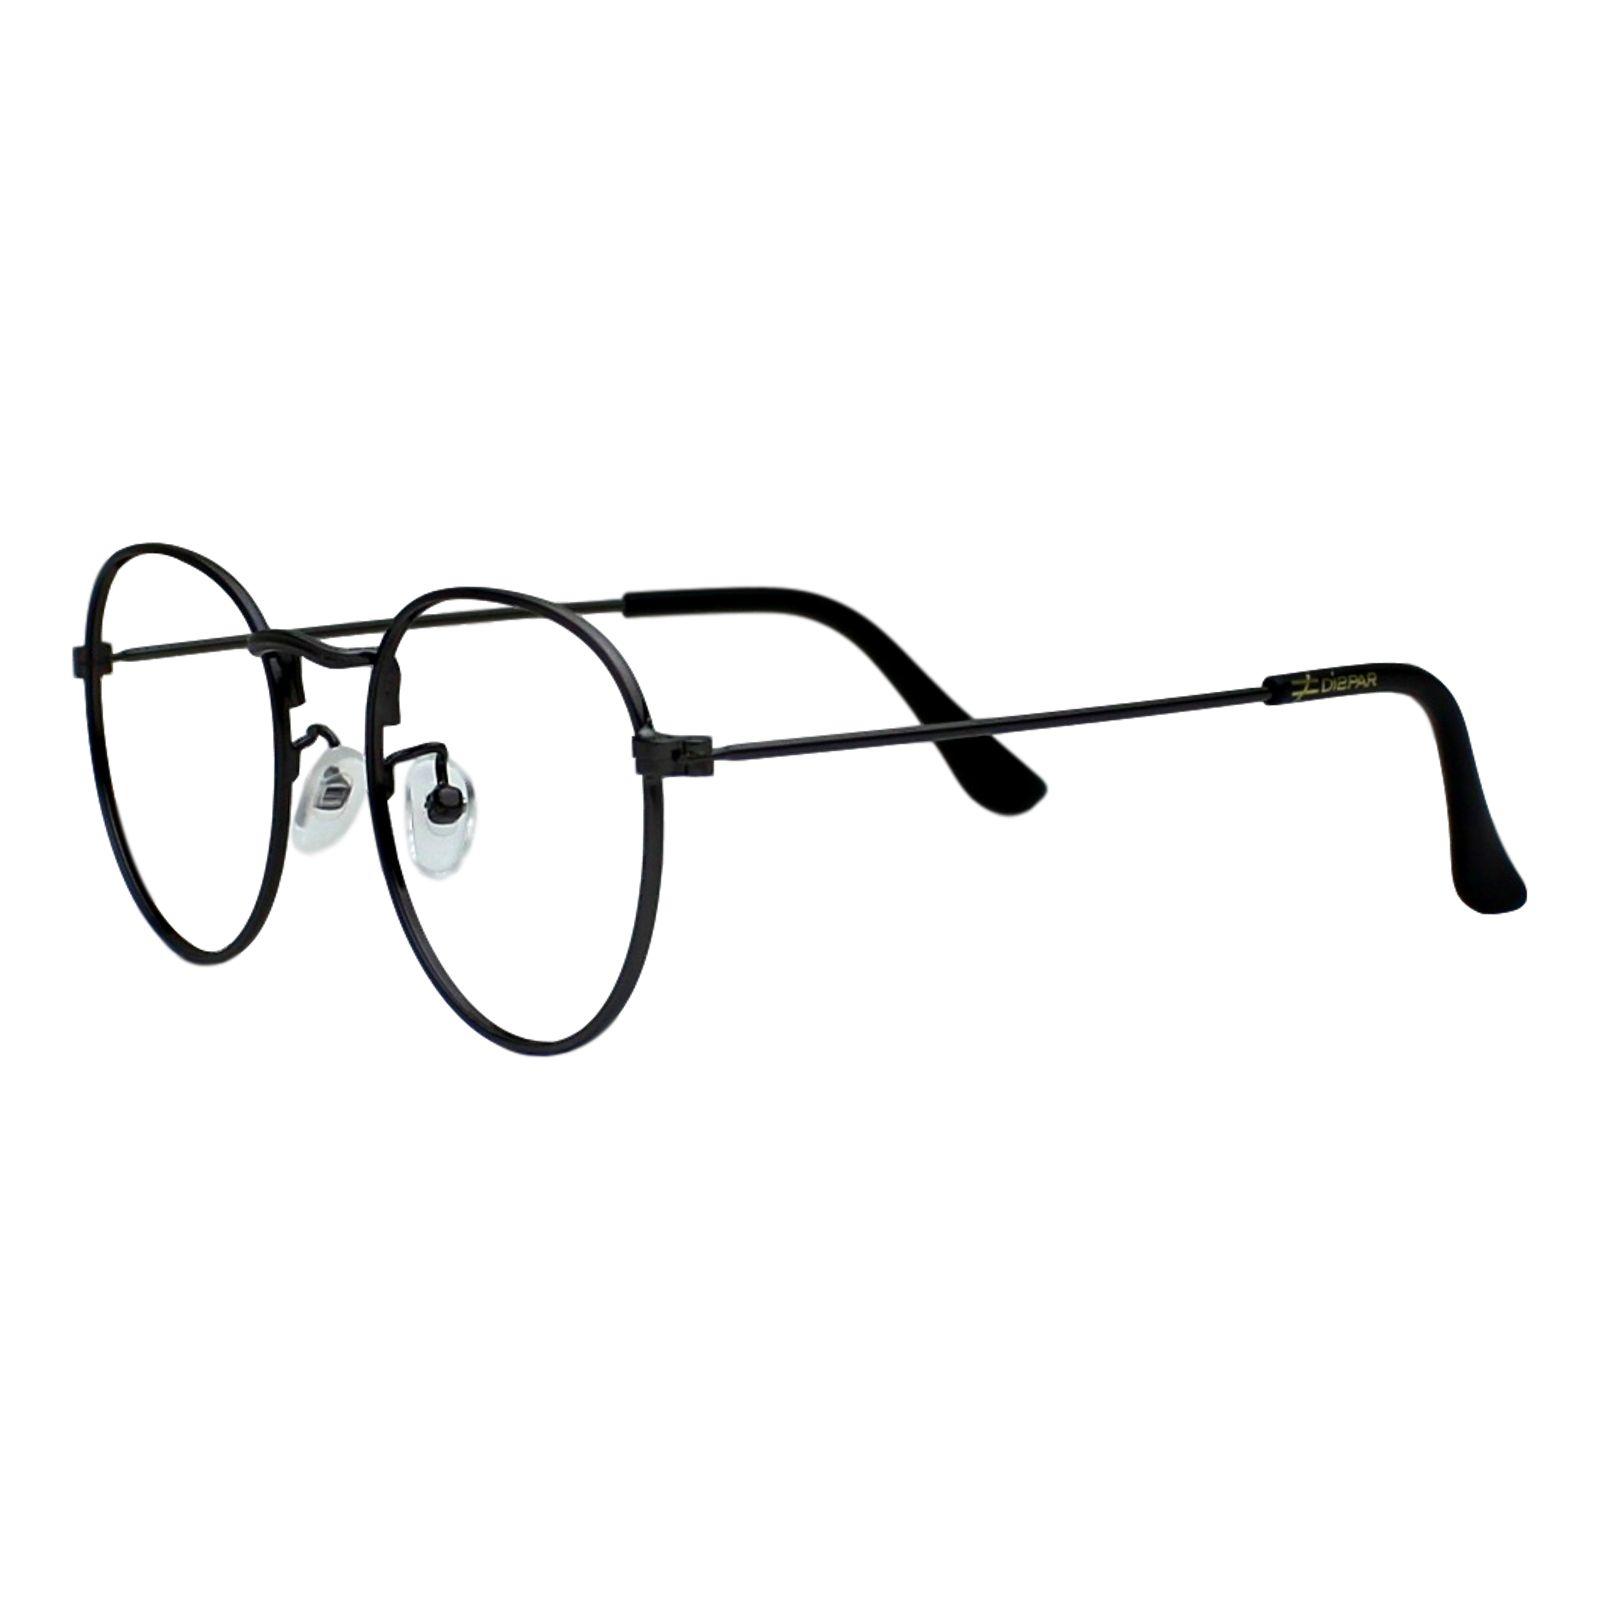 Armação para Óculos Díspar D1647 Chumbo 83655131a7